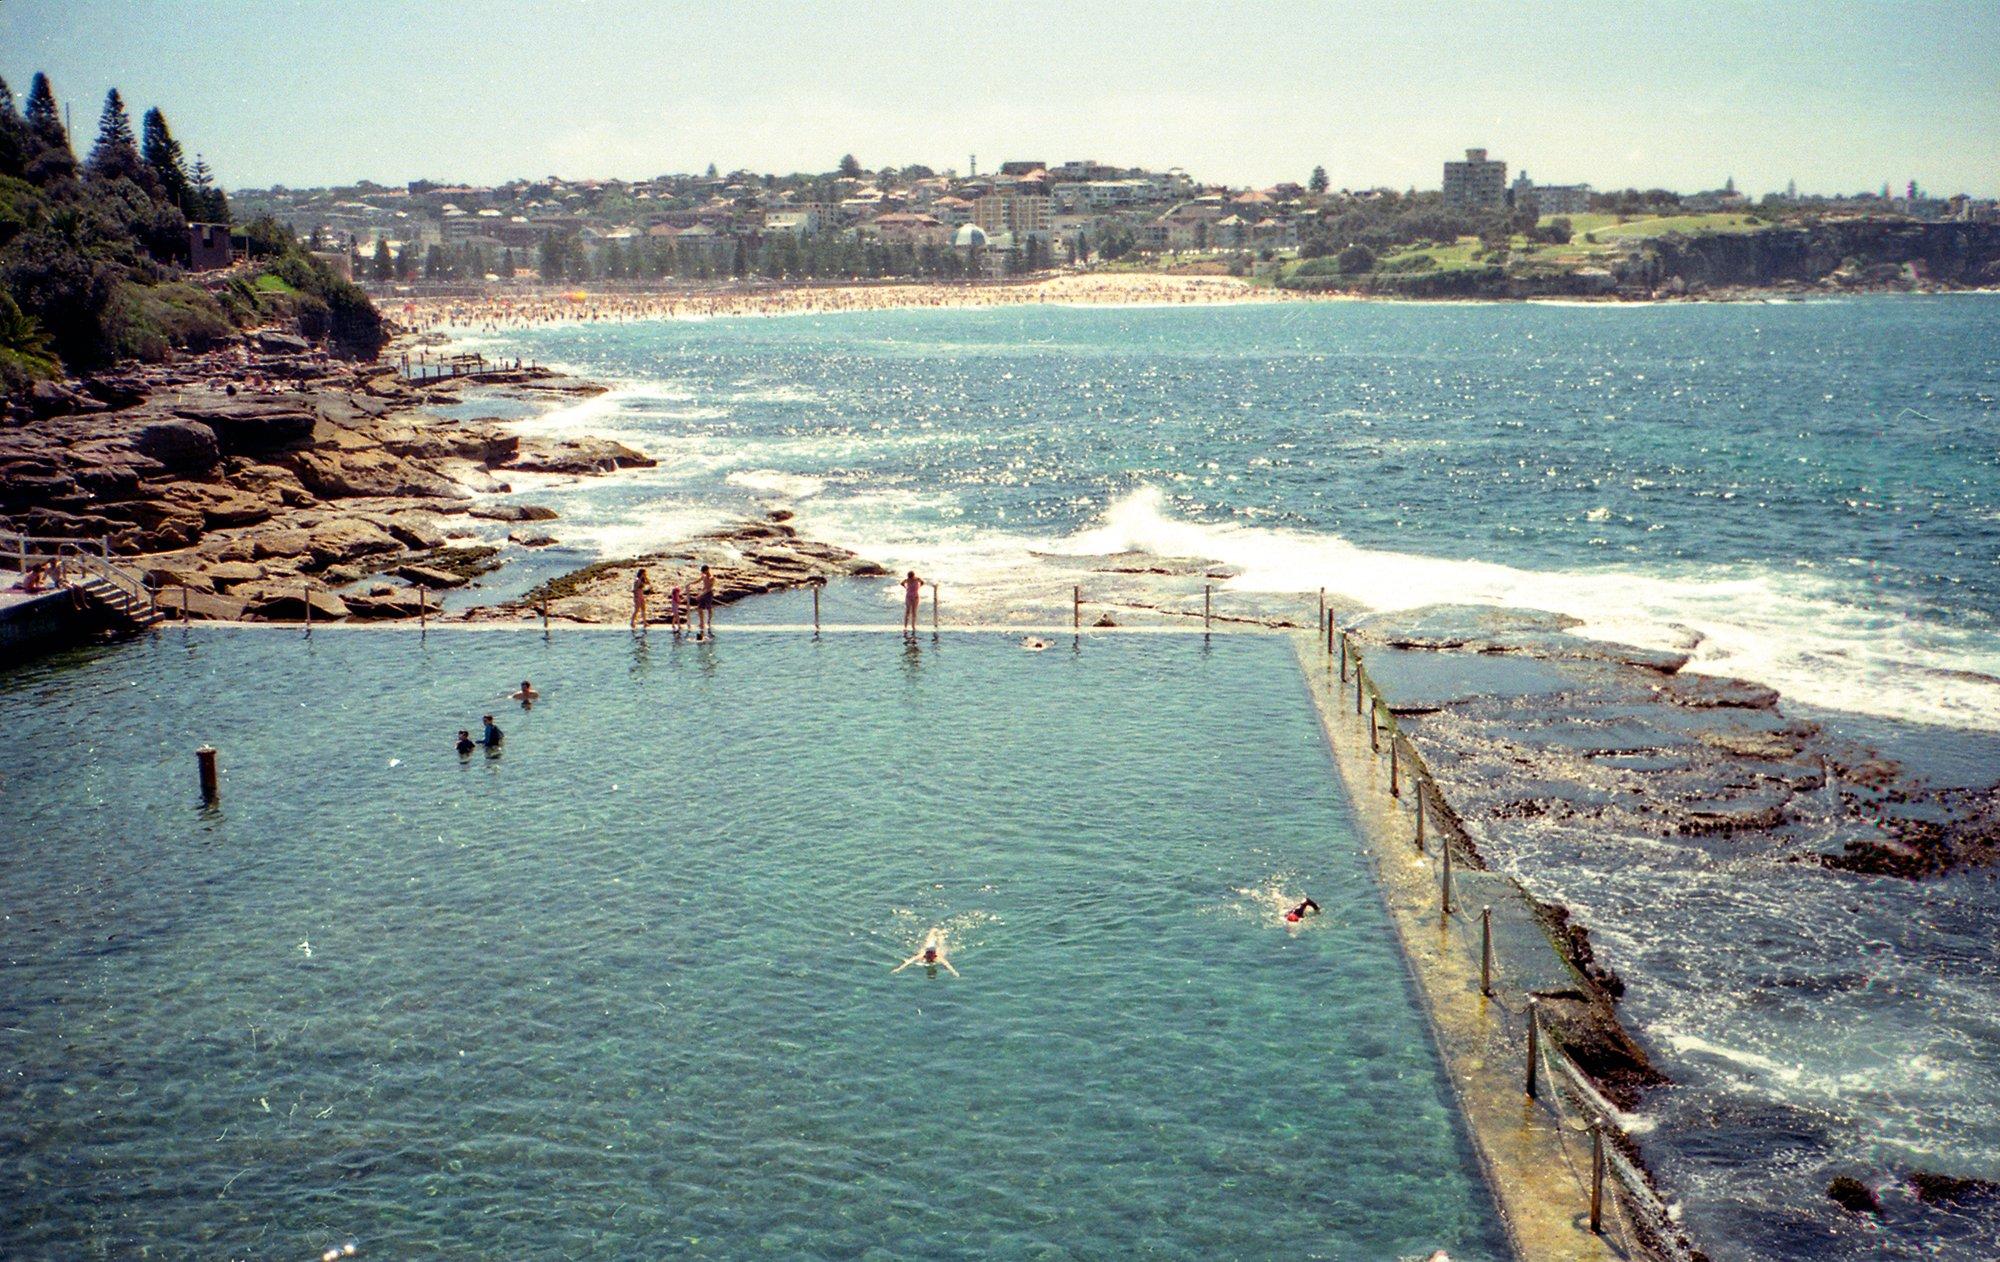 WYLIE'S BATHS, Coogee, Australien, Foto: Melanie Watkins